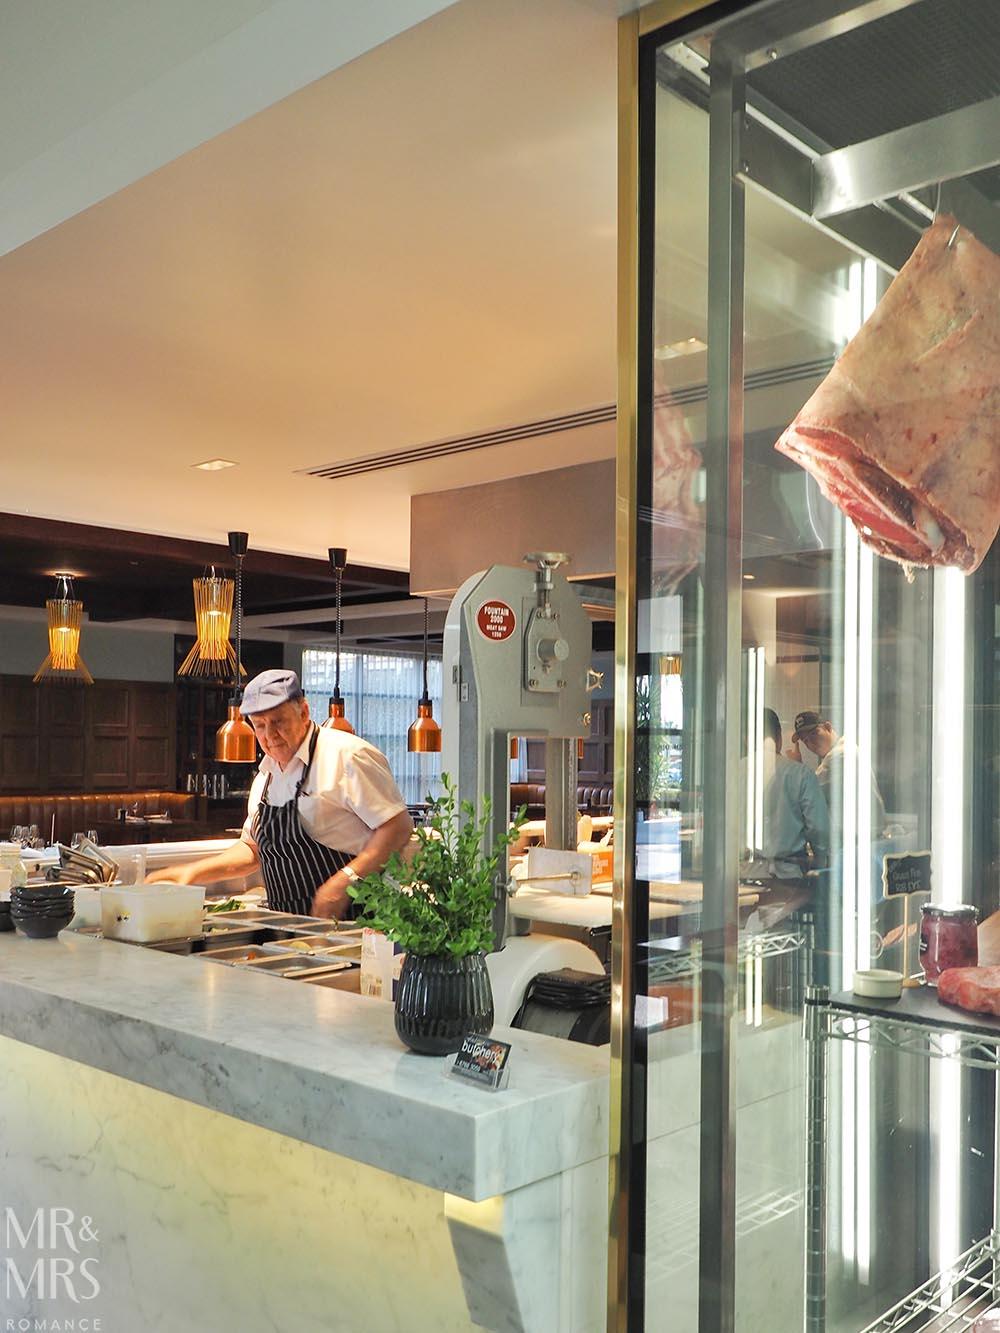 Workshop Kitchen at Powerhouse Hotel Tamworth - best steak in Australia - chef and meat